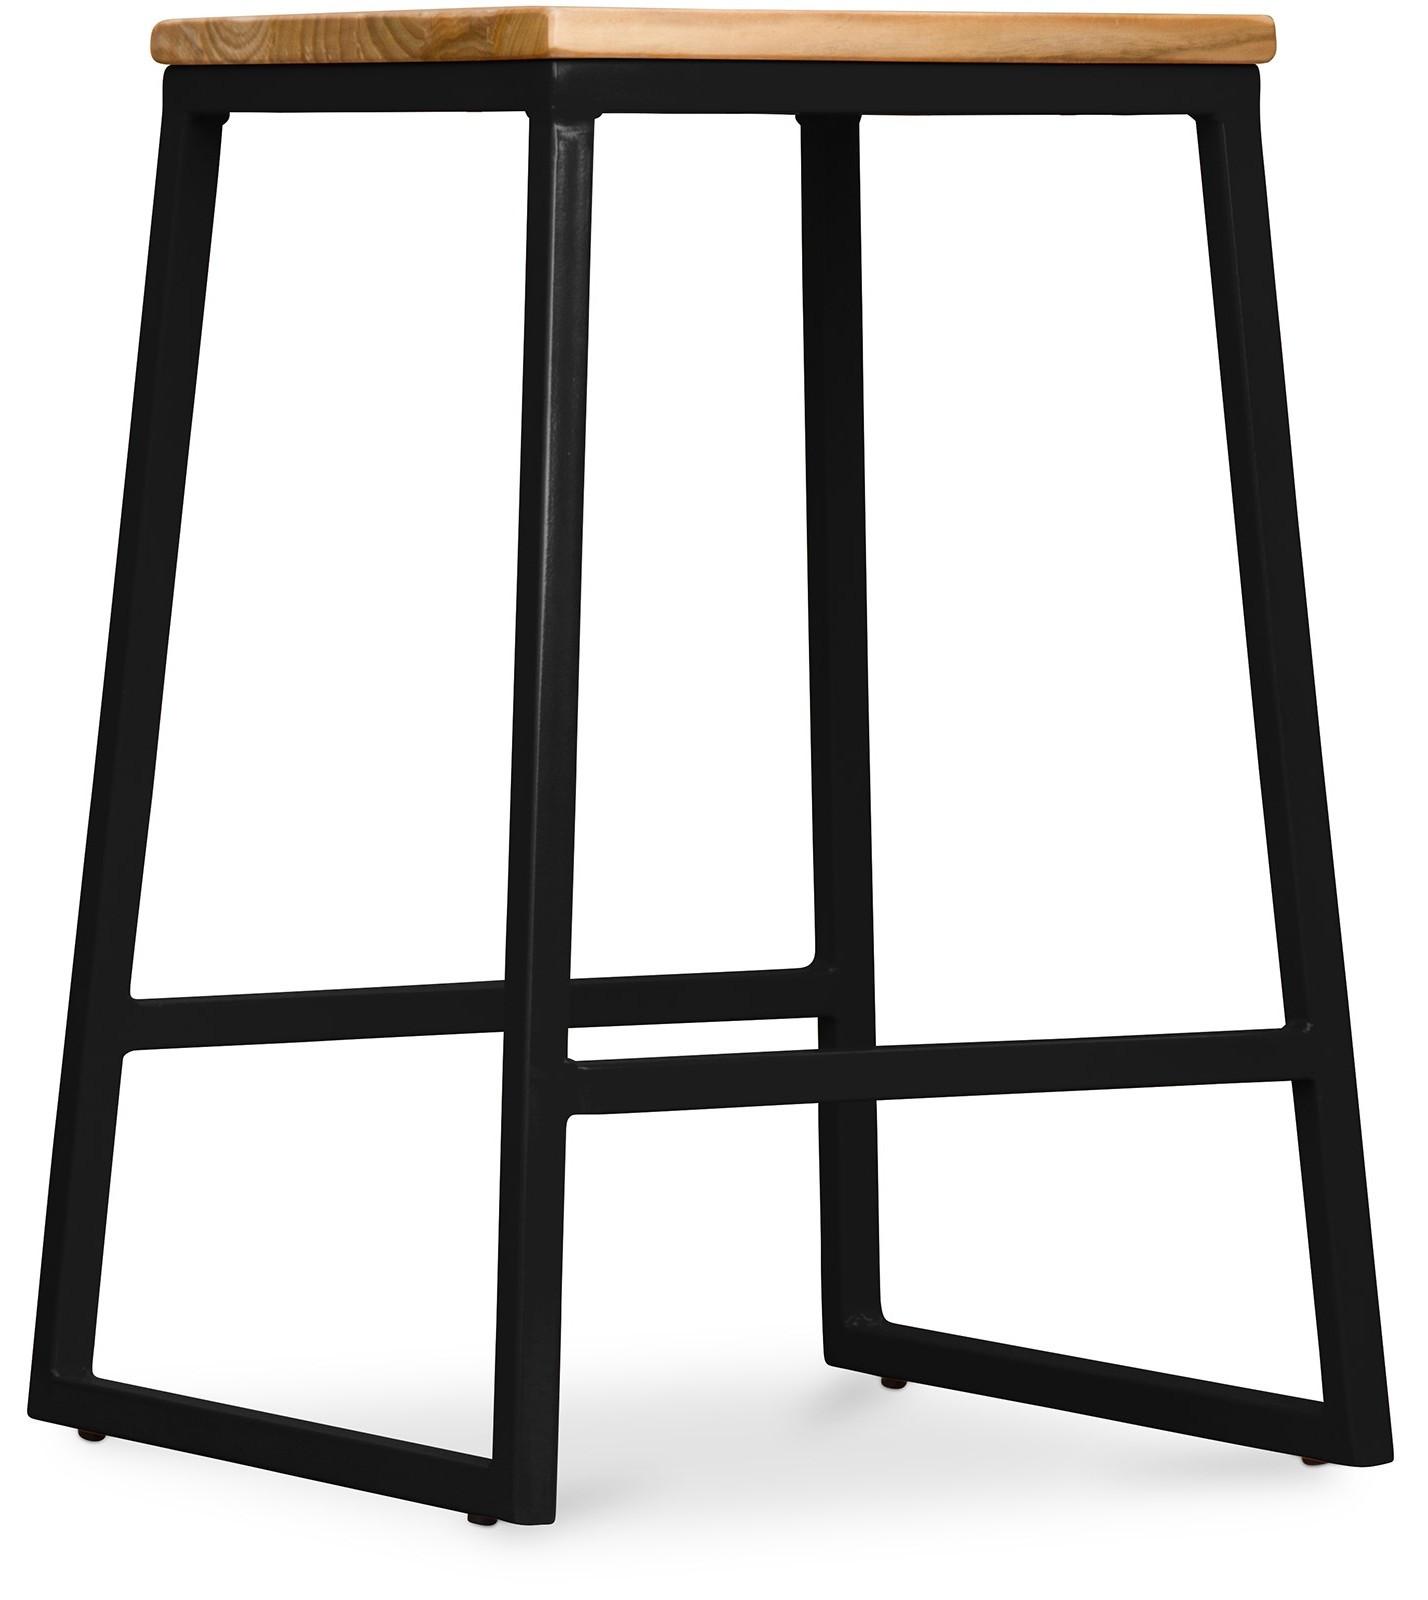 tabouret m tal noir et assise bois clair big boy. Black Bedroom Furniture Sets. Home Design Ideas